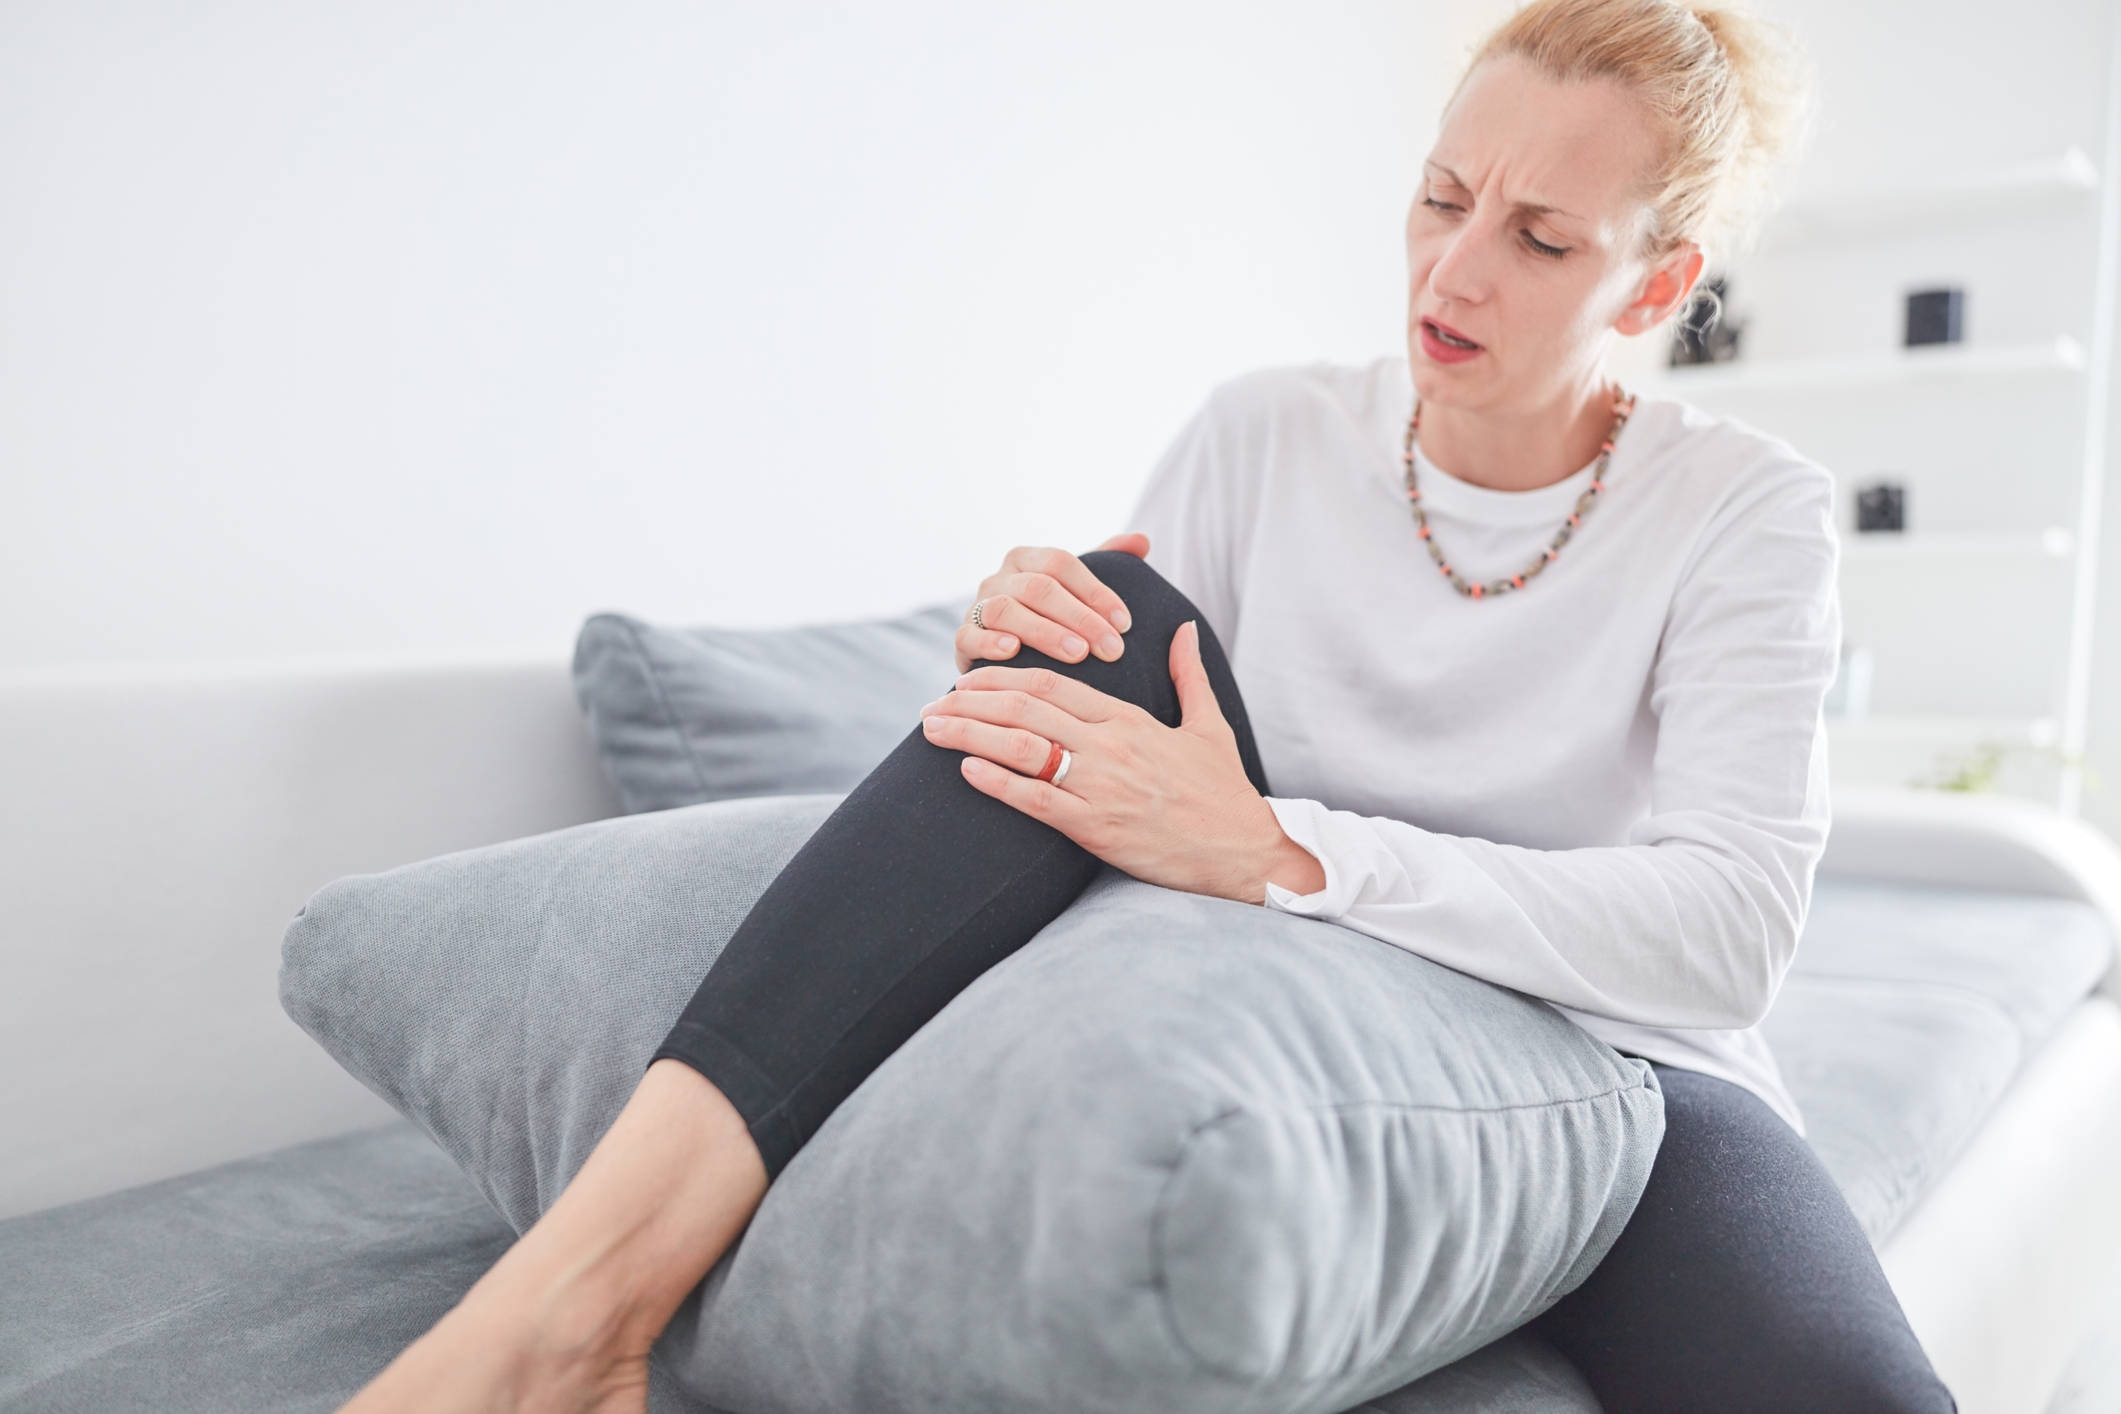 hibiszkusz magas vérnyomás a kezdeti magas vérnyomás okai